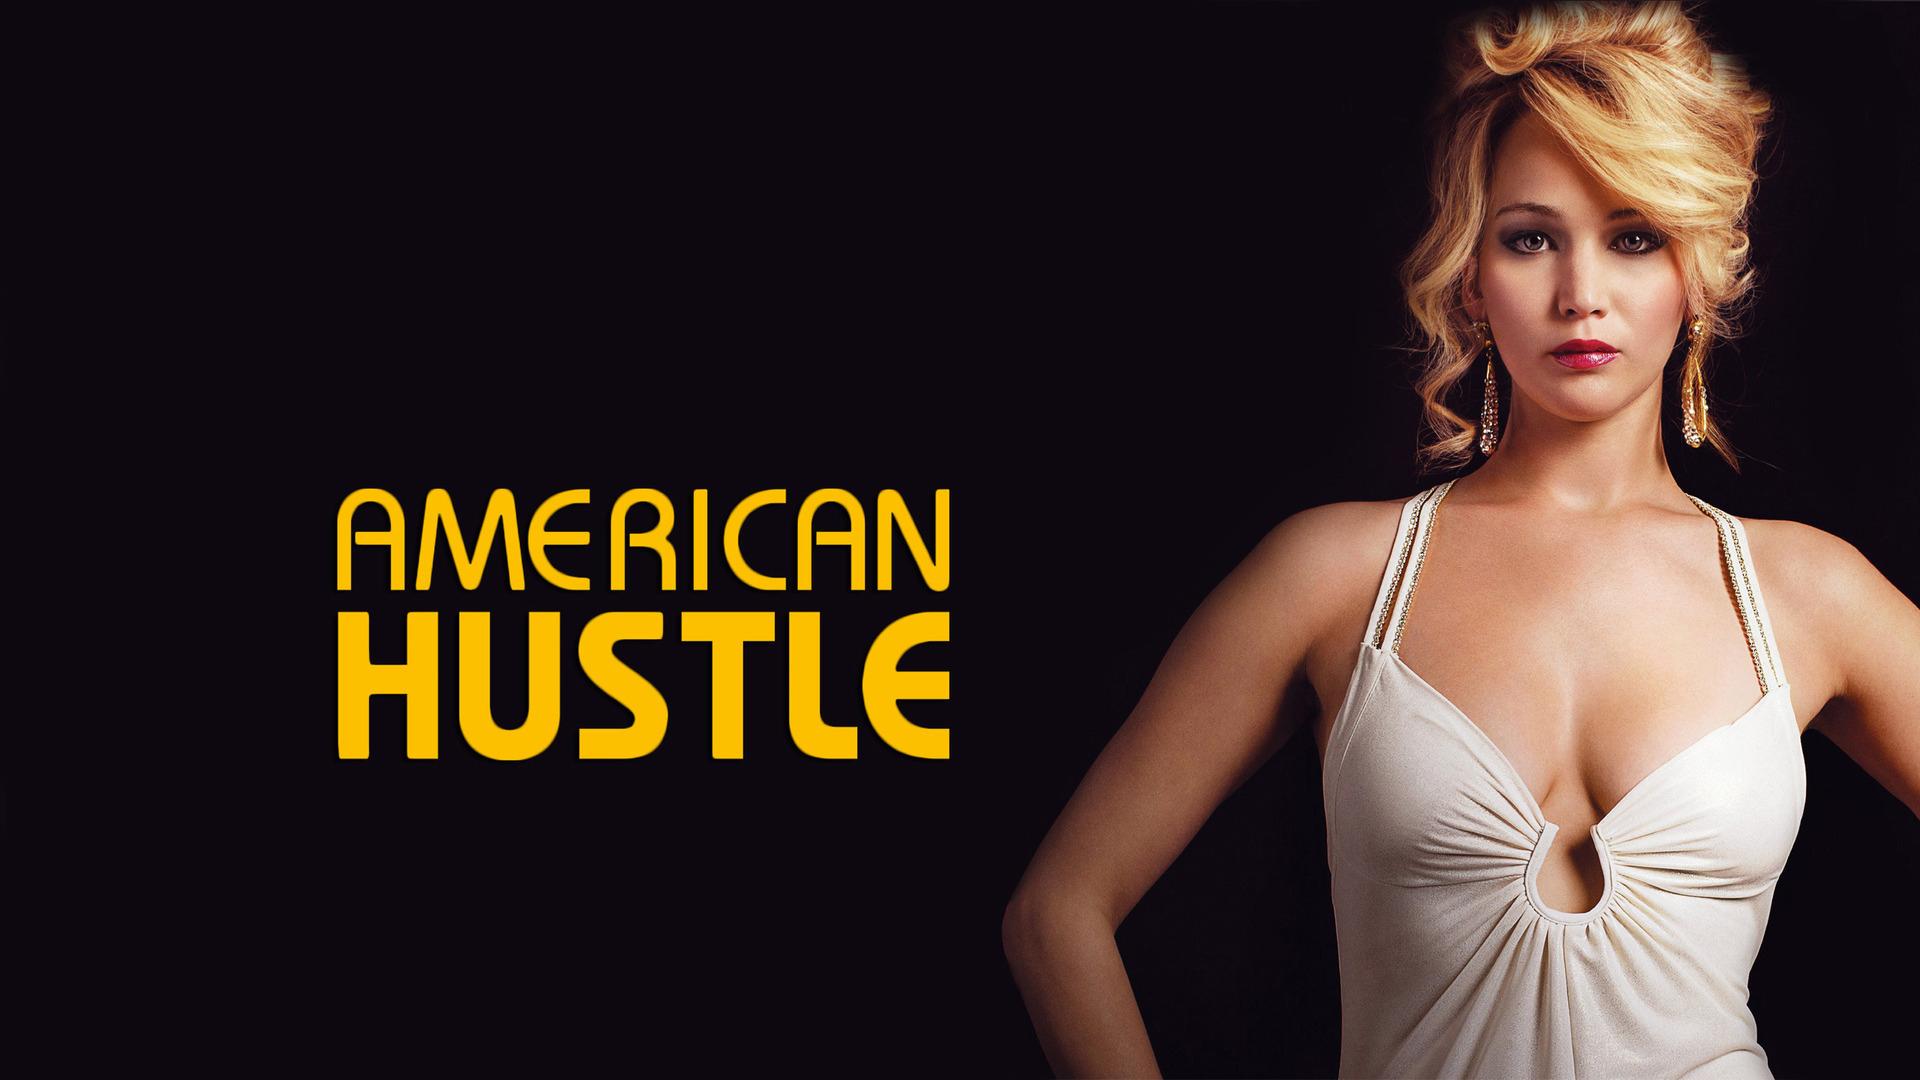 American Hustle wallpaper 1